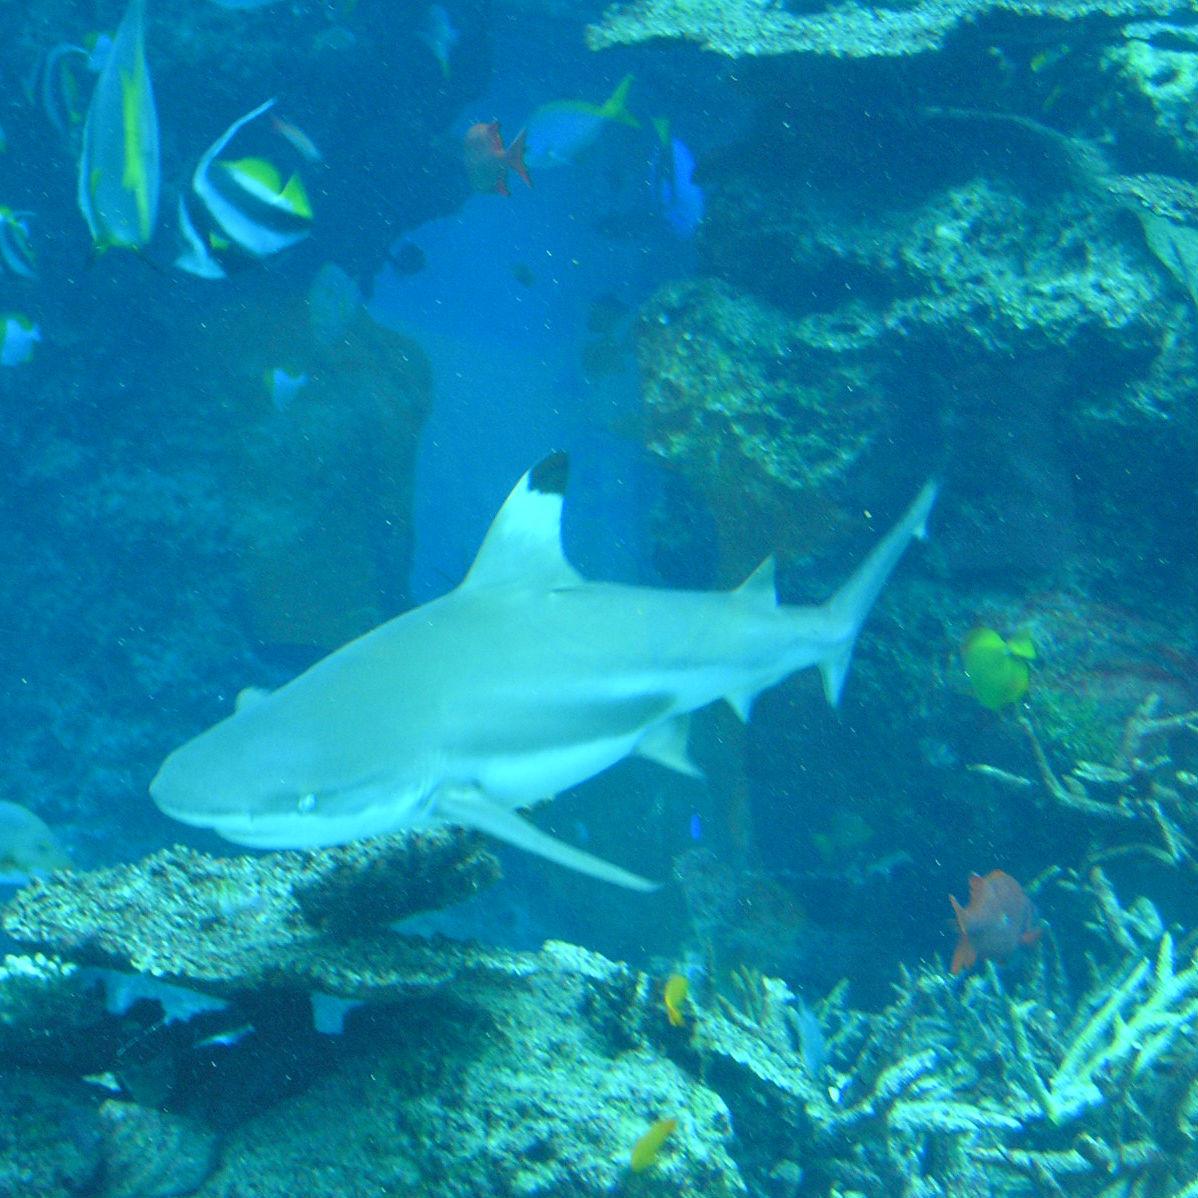 Q.最も長生きする魚「ニシオンデンザメ」の寿命は?→①100年 ②200年 ③400年